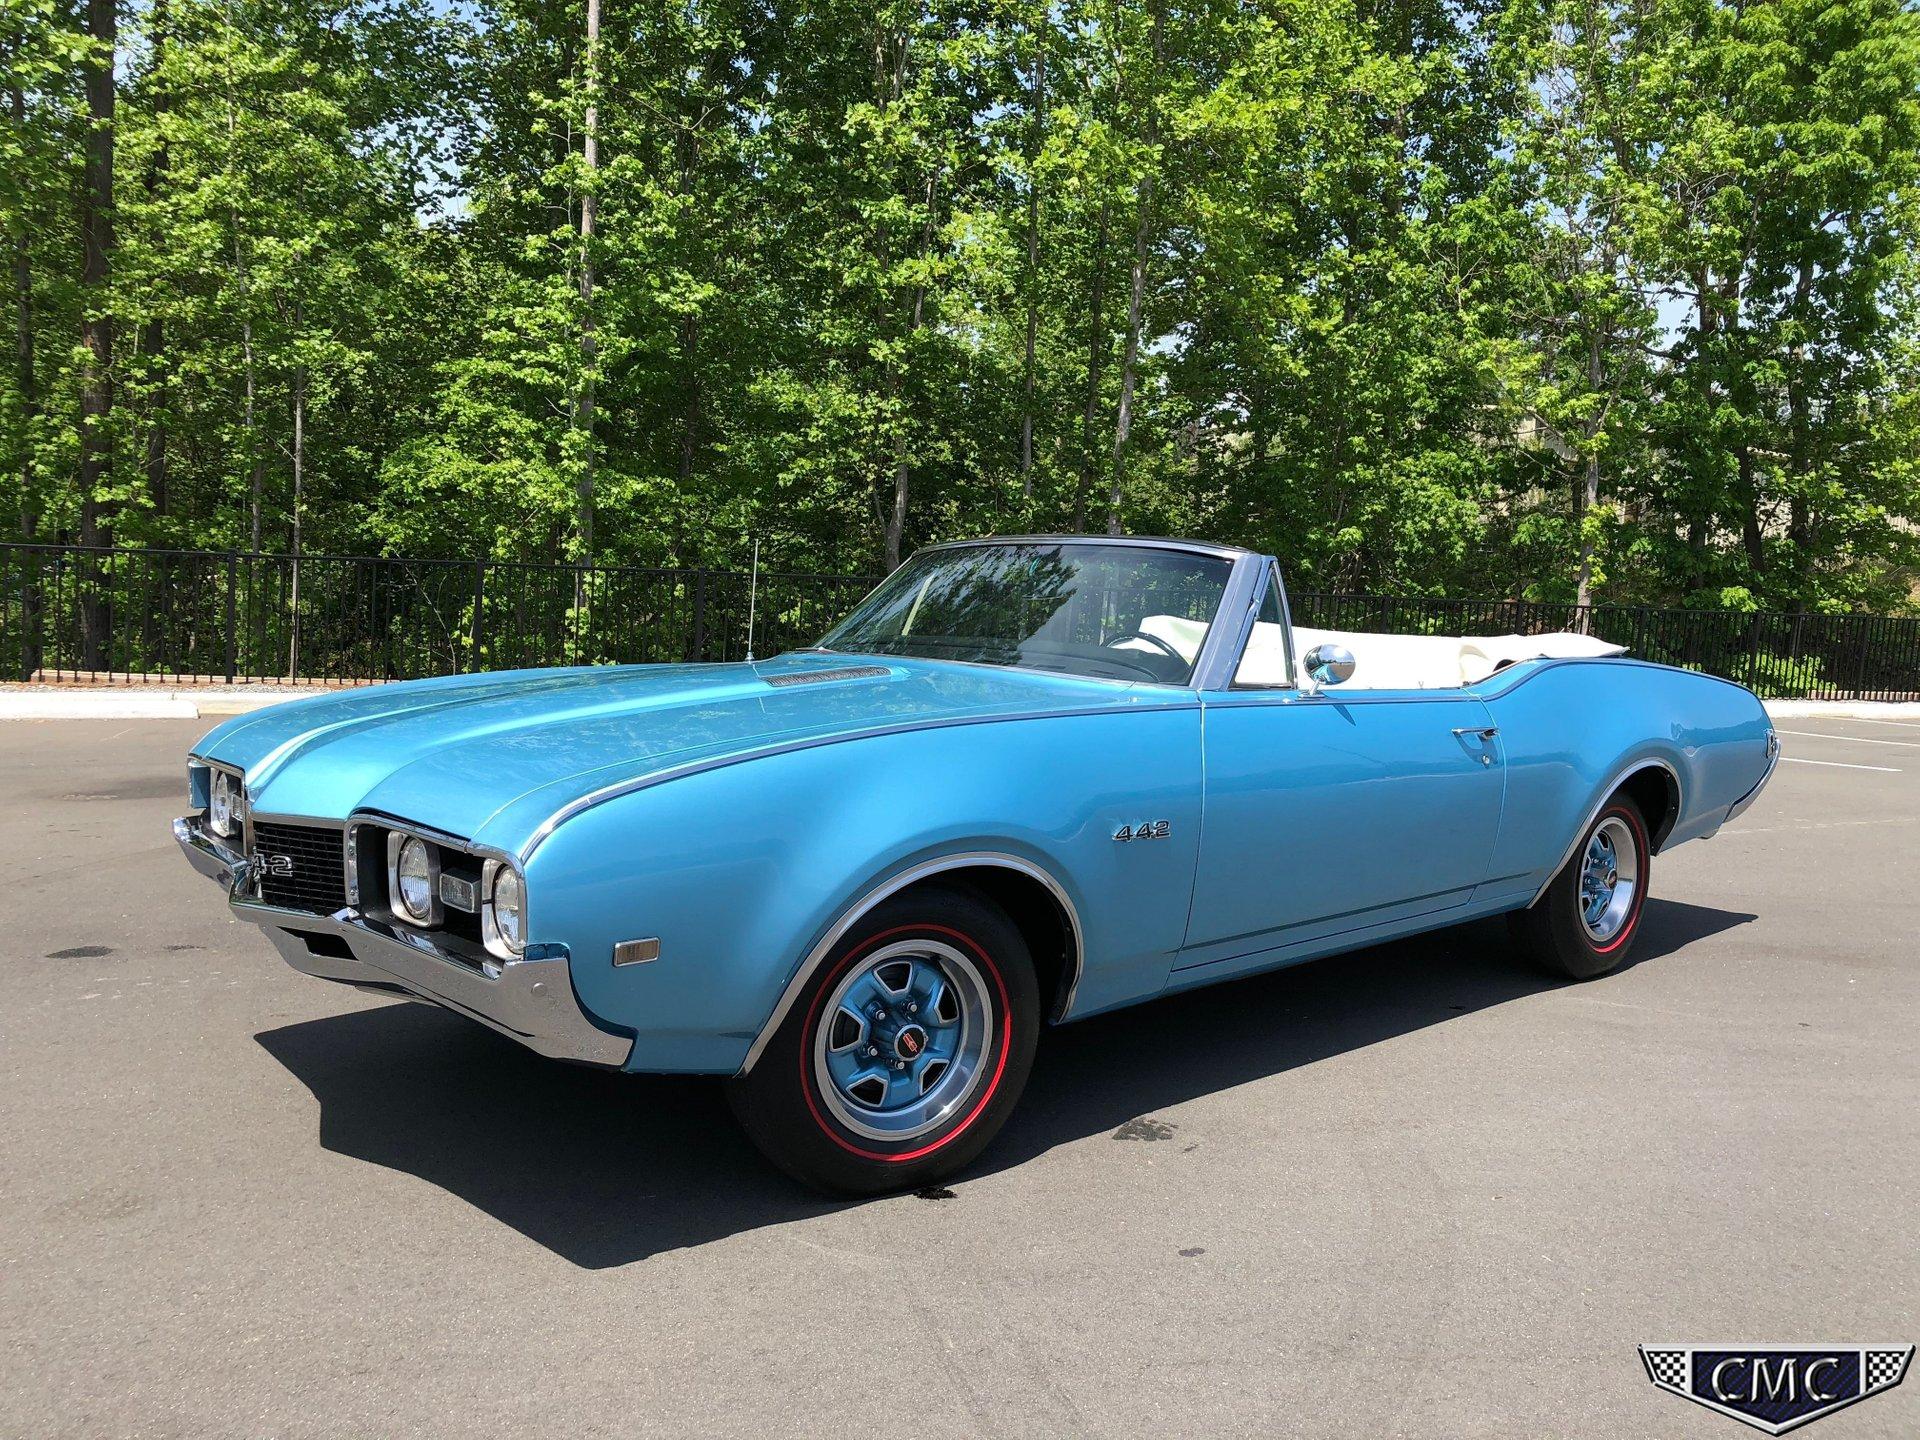 1968 Oldsmobile 442 | Carolina Muscle Cars Inc